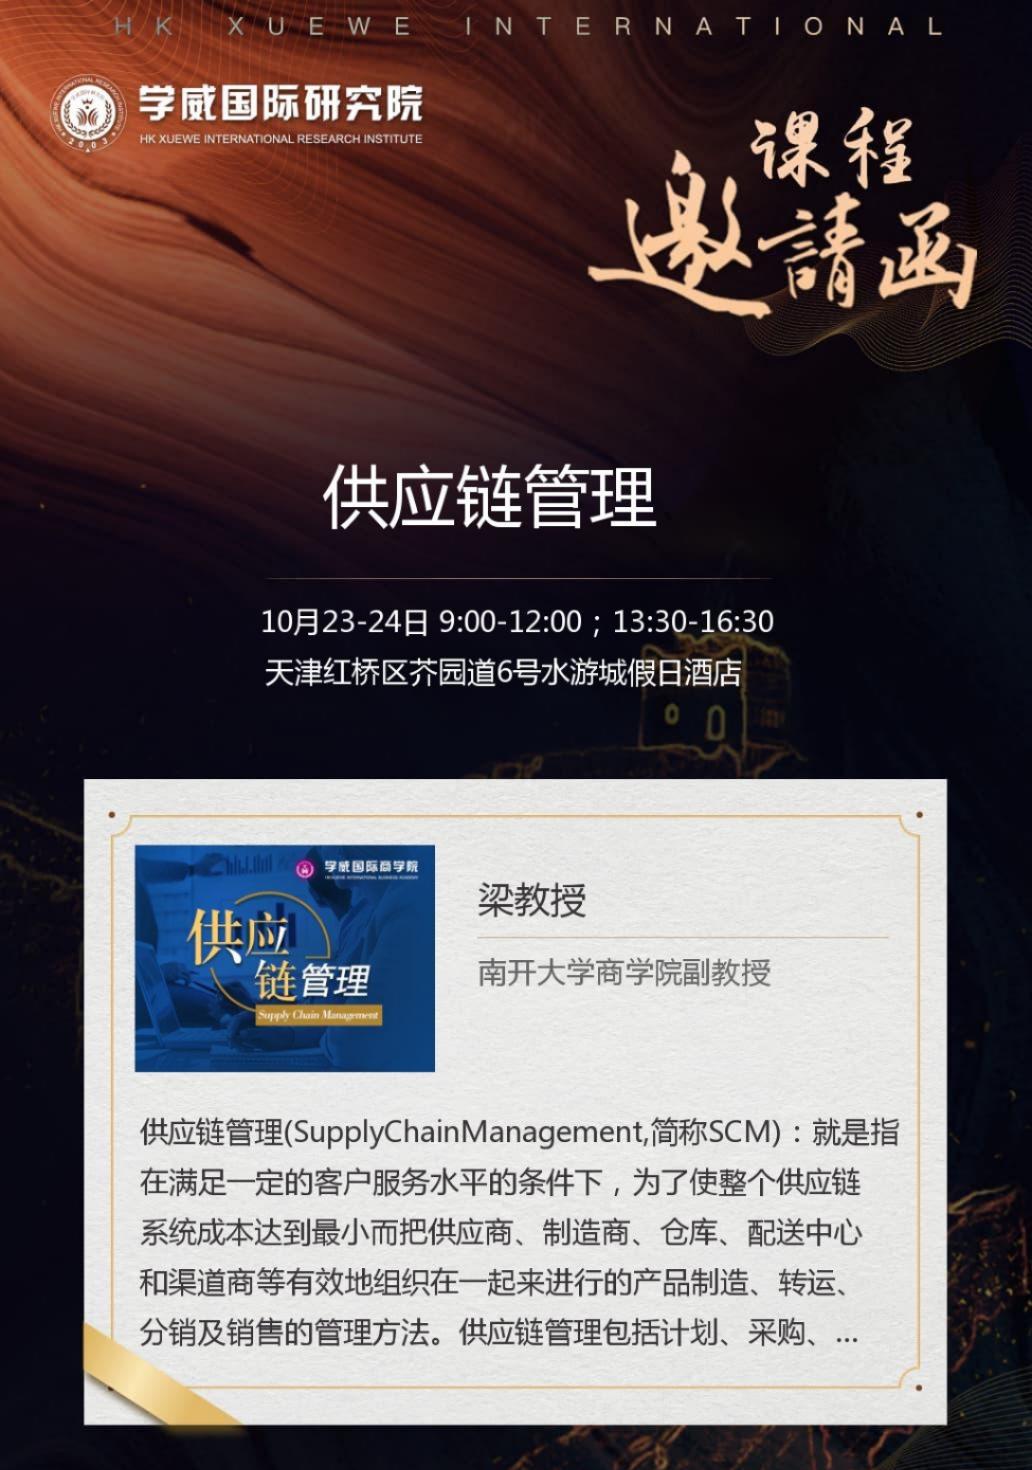 http://www.huodongxing.com/file/20210623/3634191590865/144299393025835.jpg